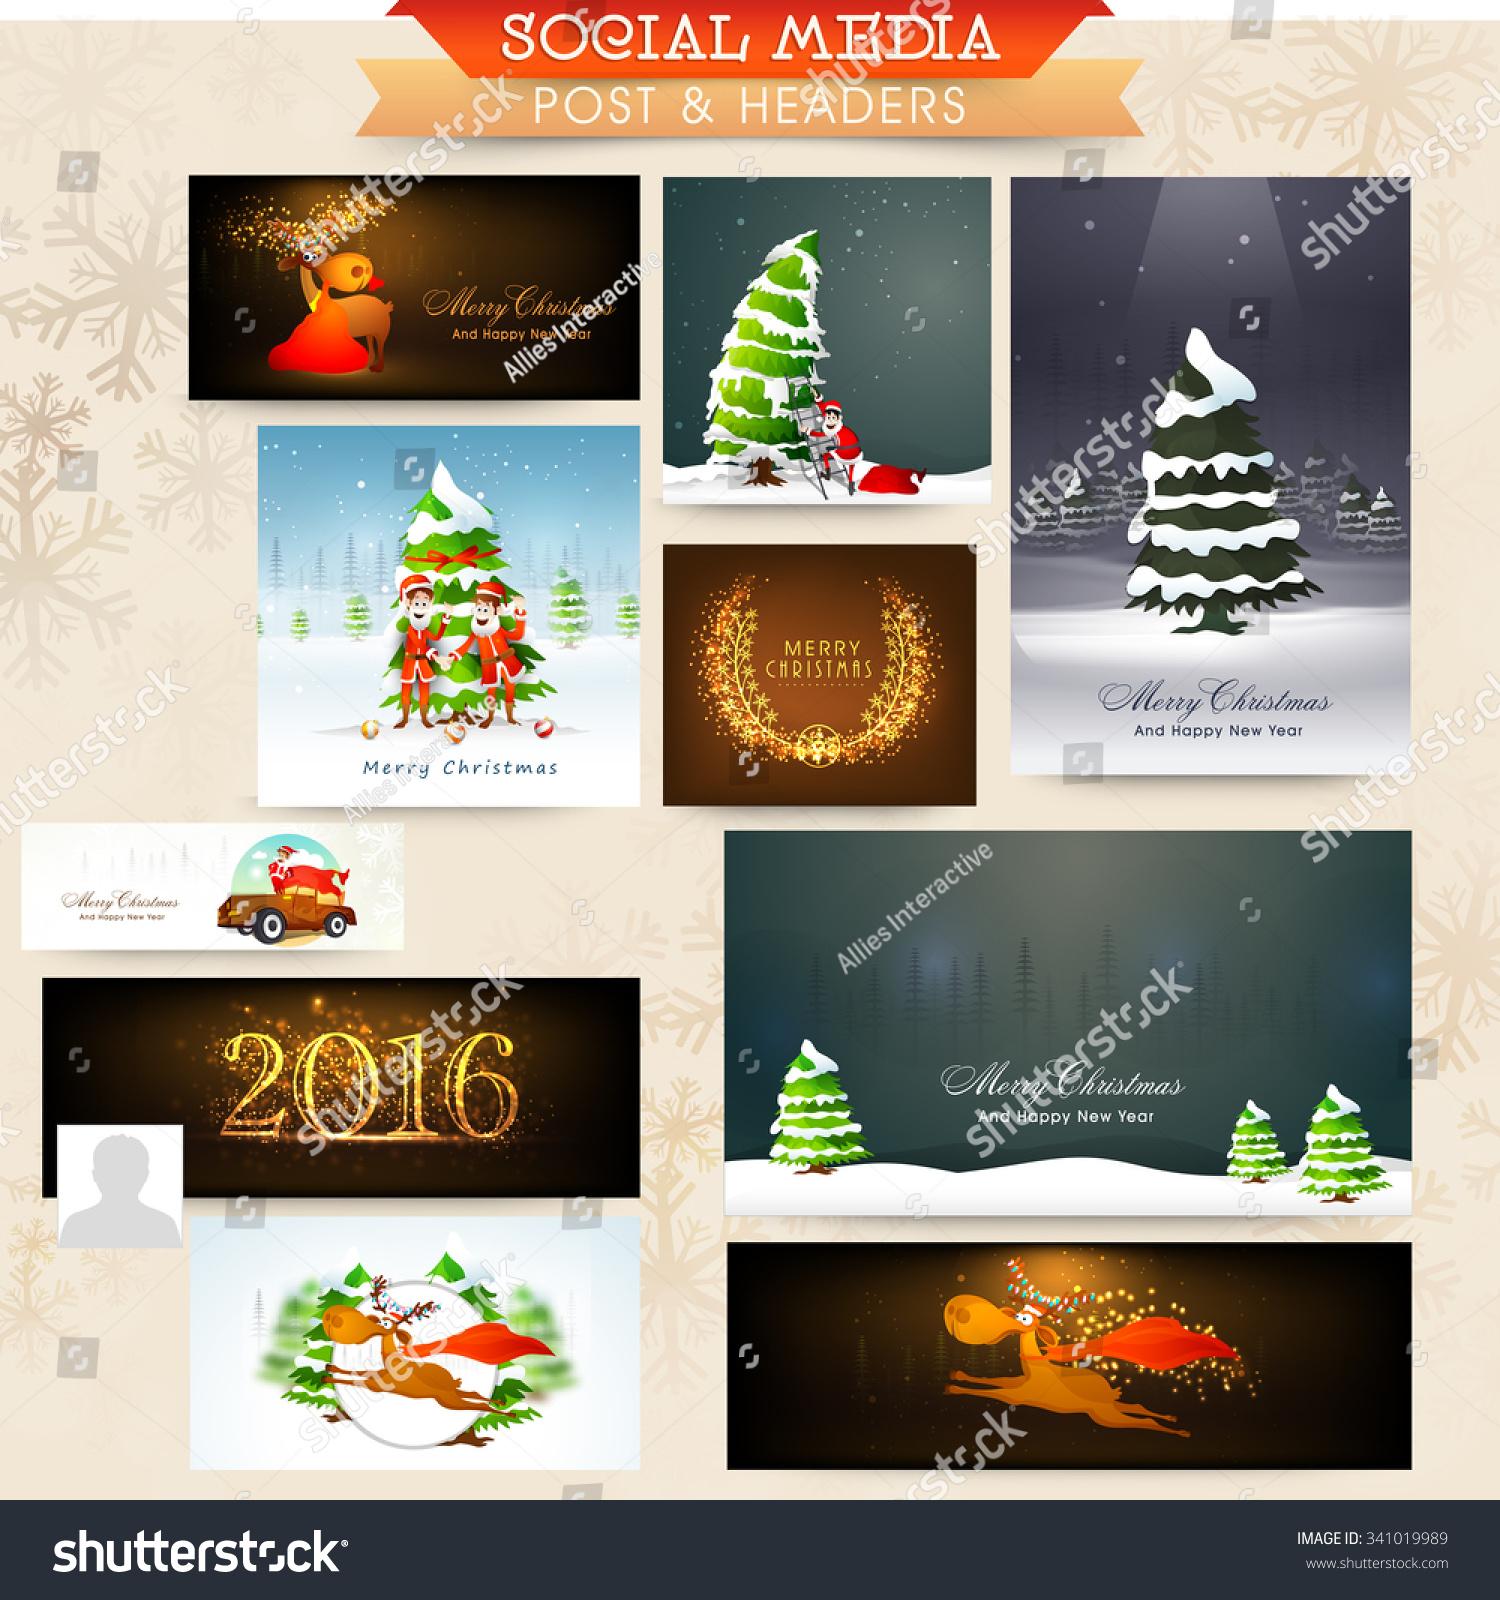 Merry Christmas Headings Stock Vector Glossy Elegant Social Media Post Ads